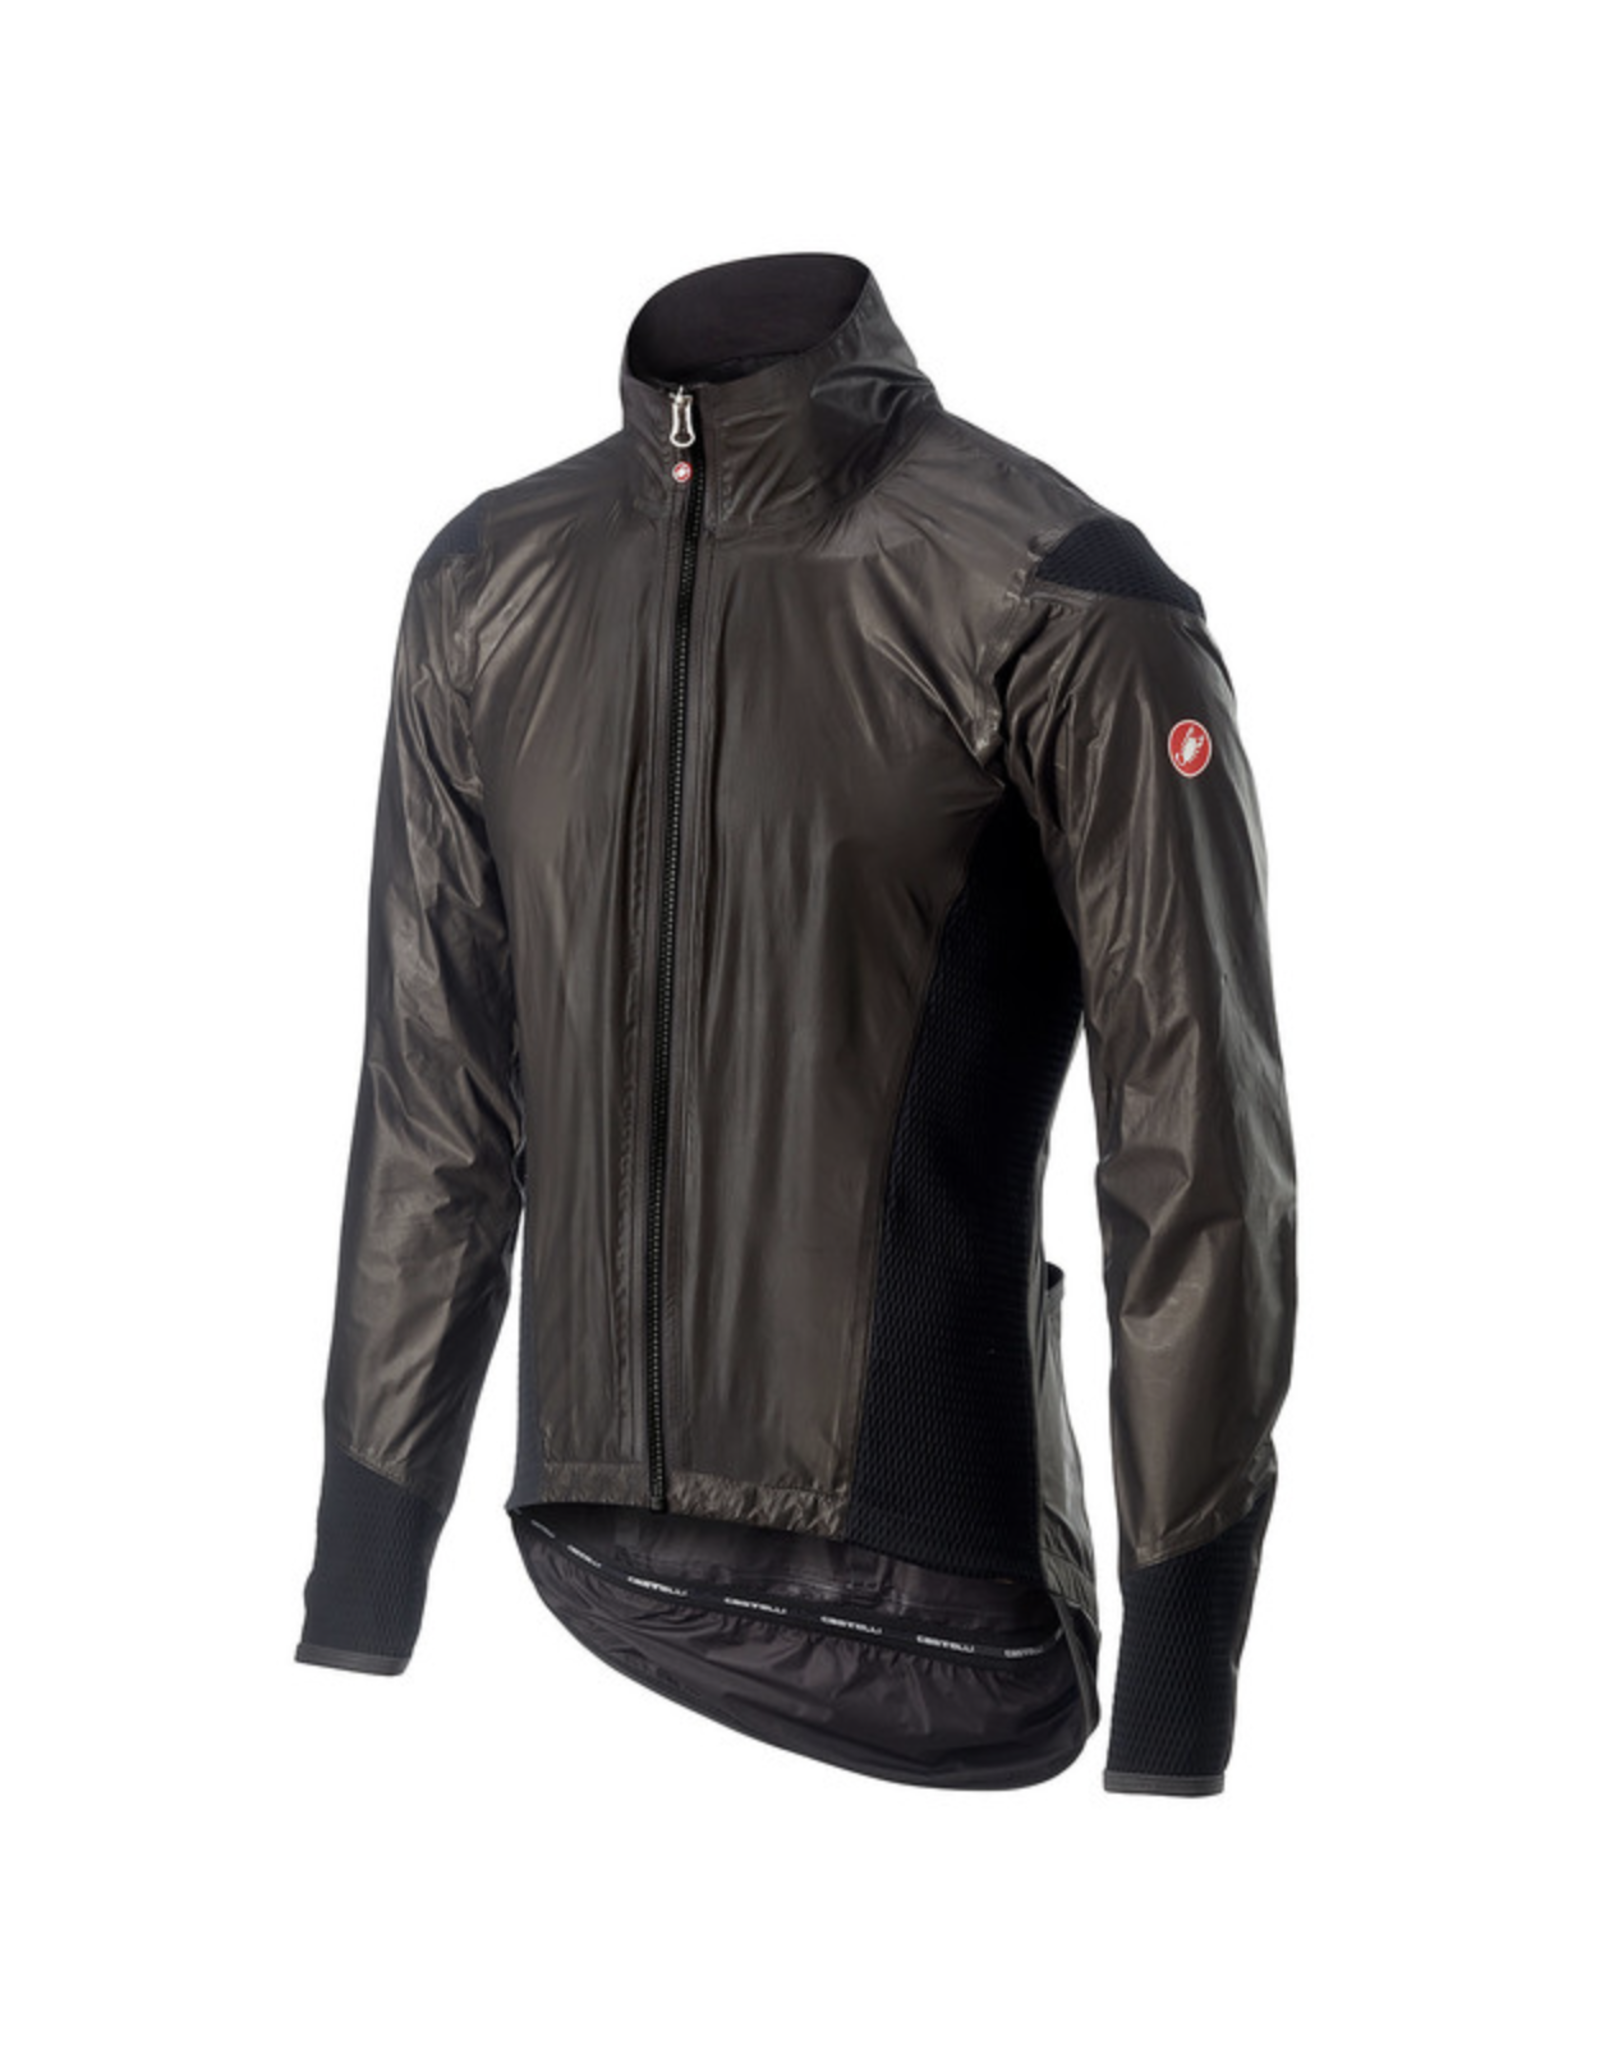 Castelli '20, CASTELLI, Idro Pro 2 Jacket